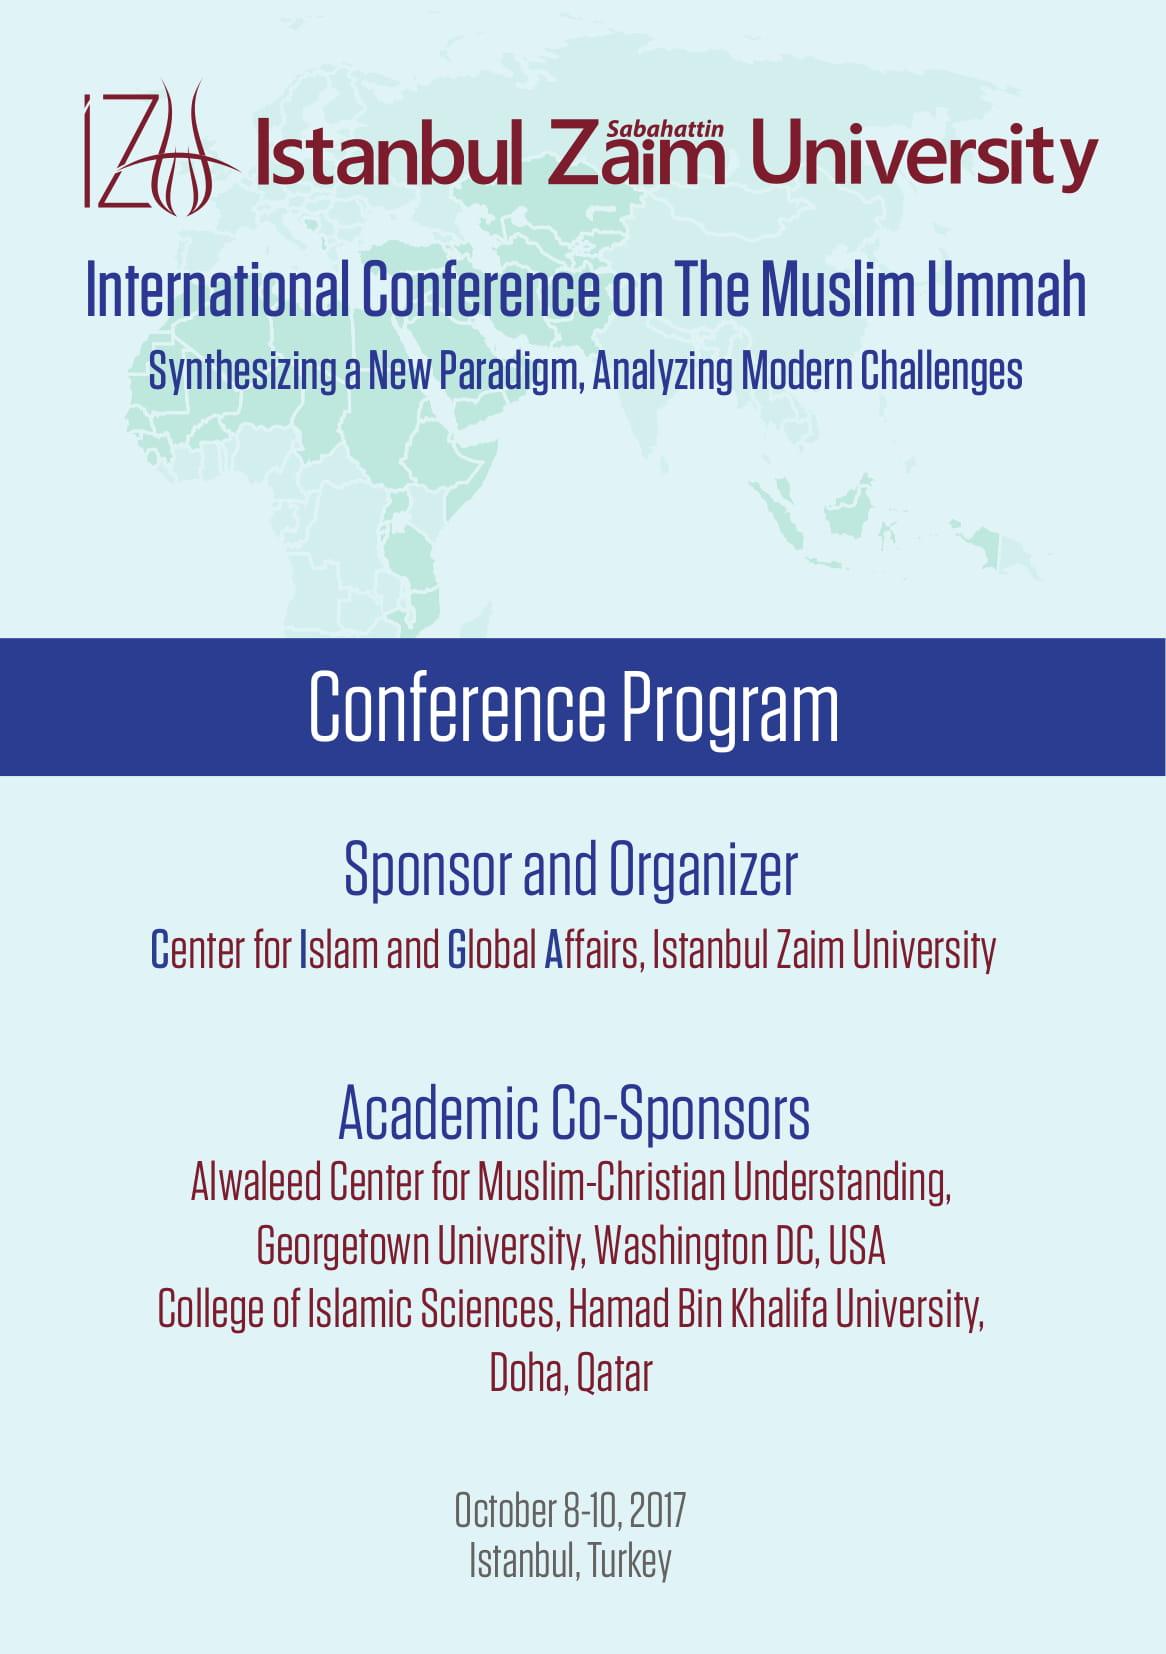 1st International Conference on The Muslim Ummah